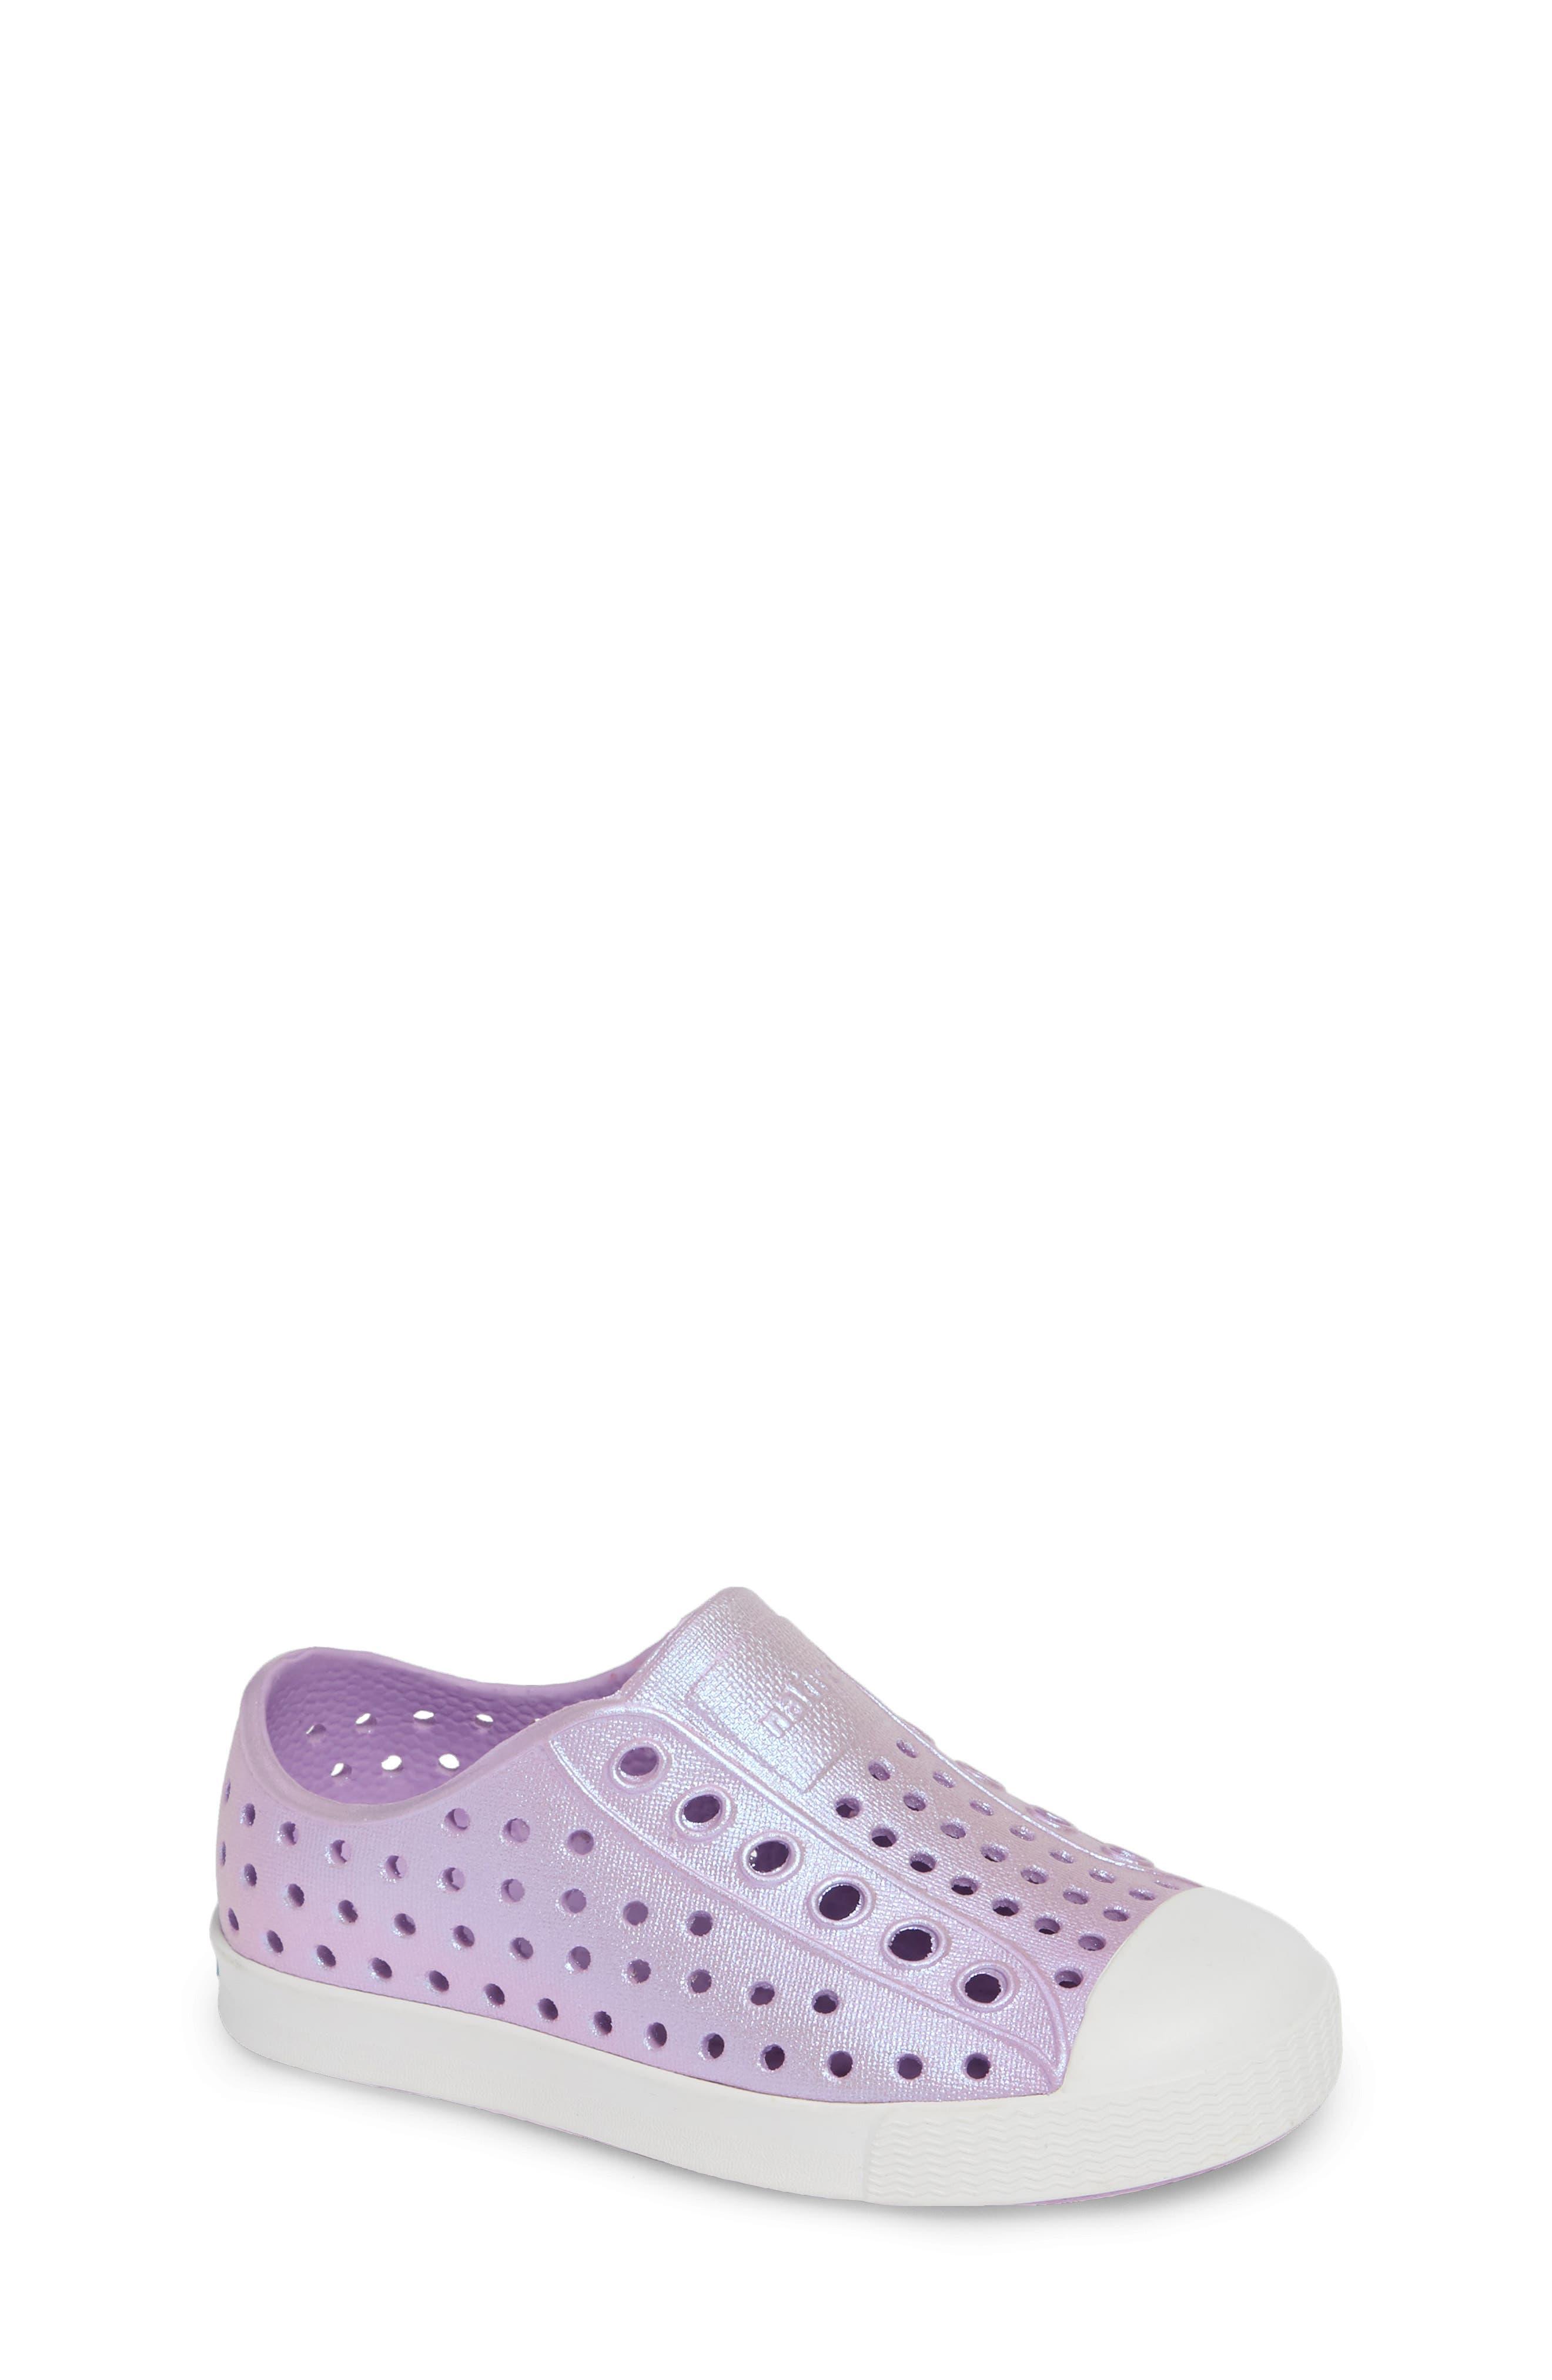 Jefferson Iridescent Slip-On Vegan Sneaker, Main, color, LAVENDER/ SHELL WHITE/ GALAXY